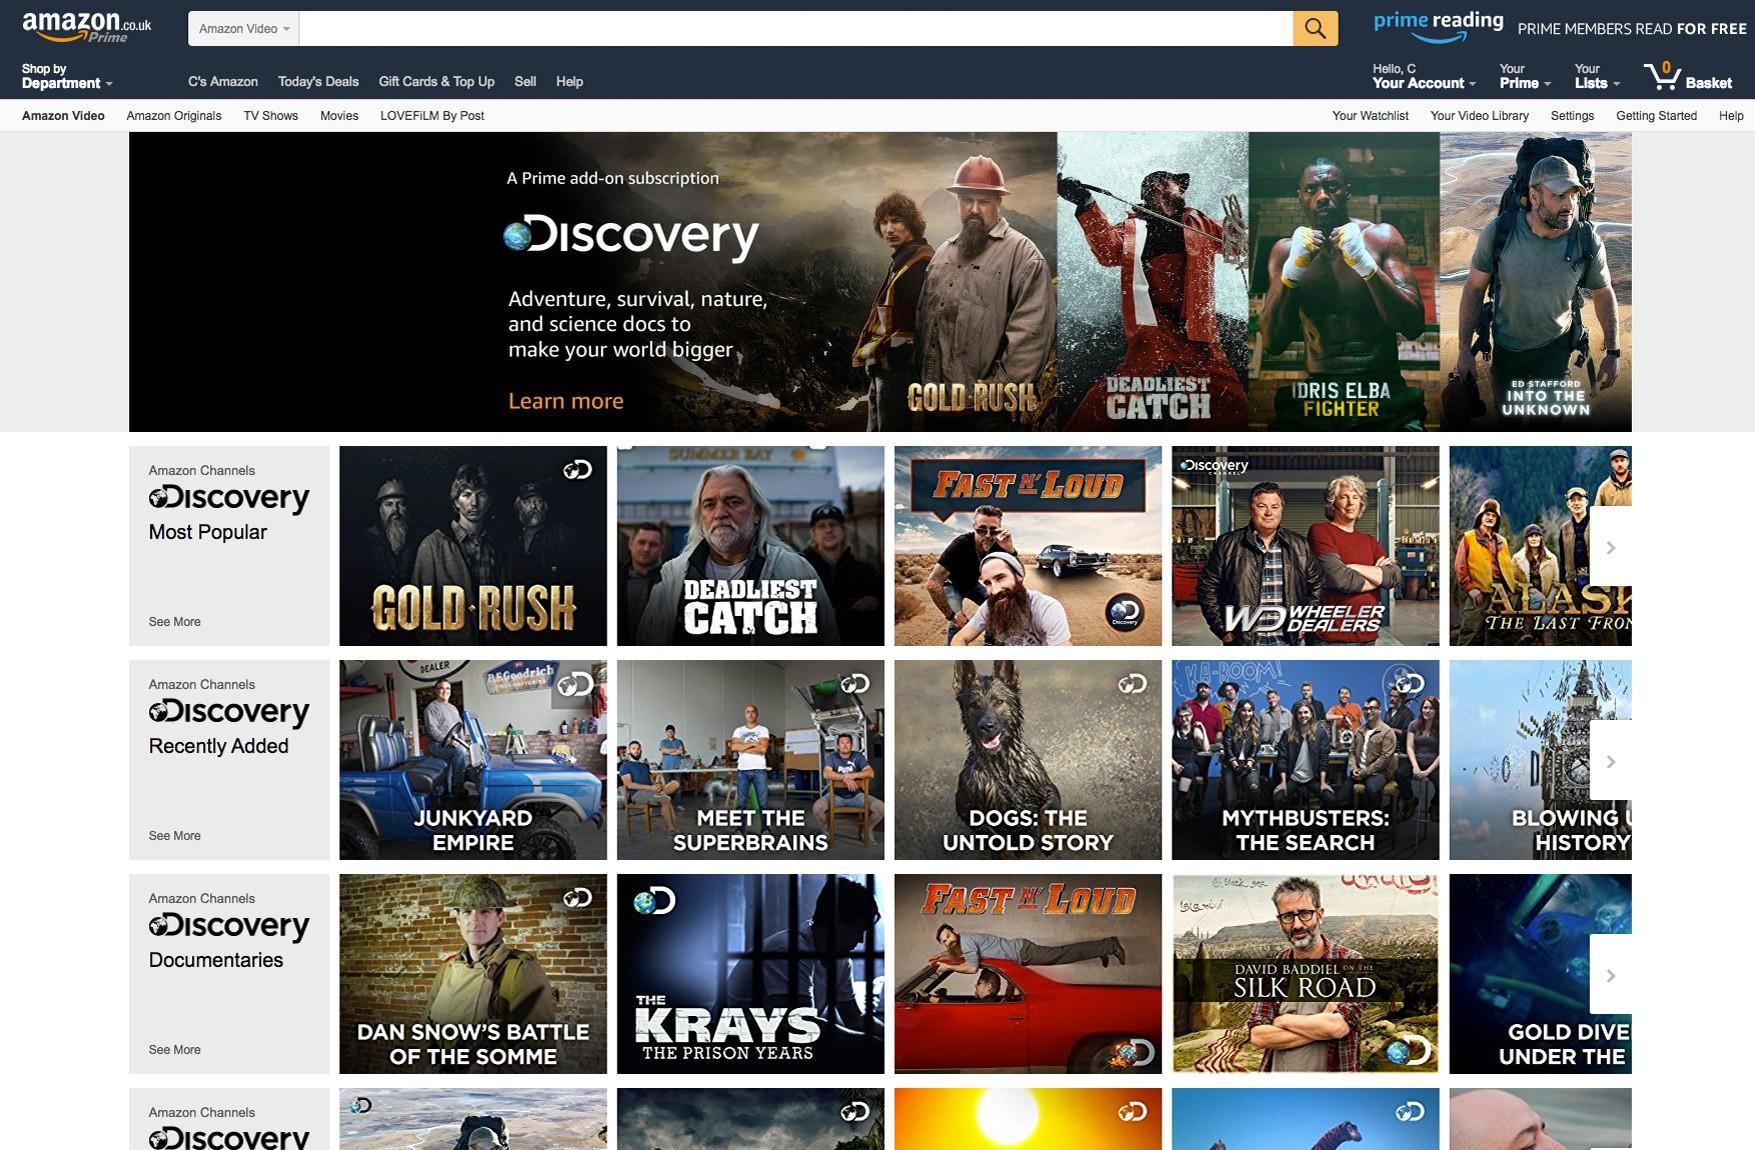 Amazon Channels screenshot